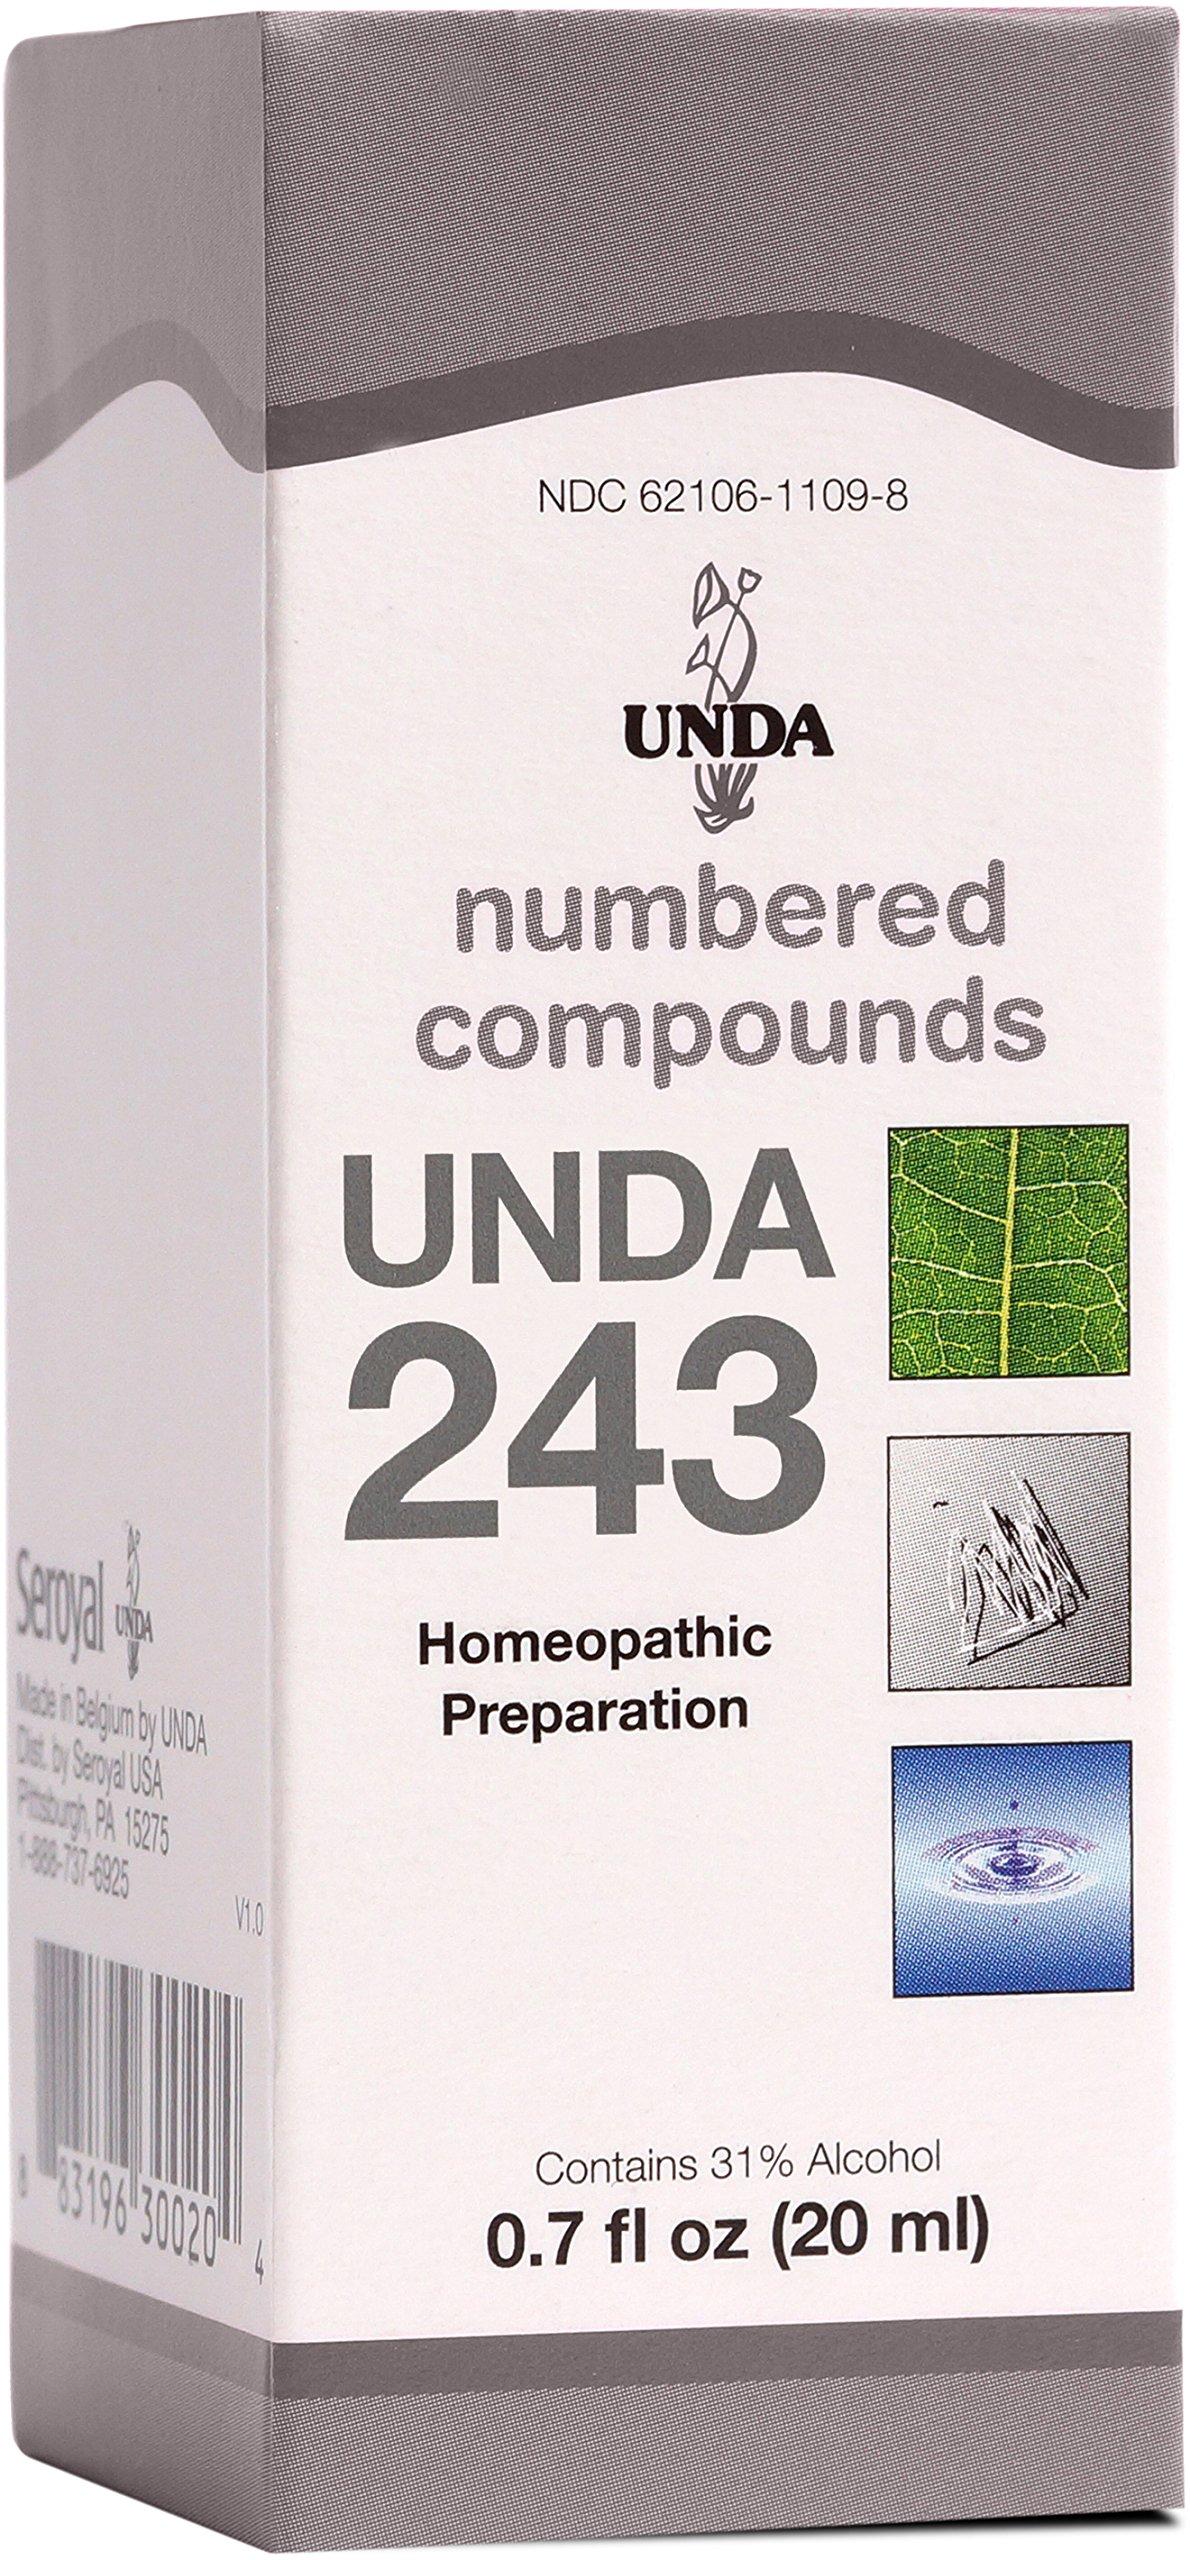 UNDA - UNDA 243 Numbered Compounds - Homeopathic Preparation - 0.7 fl oz (20 ml)